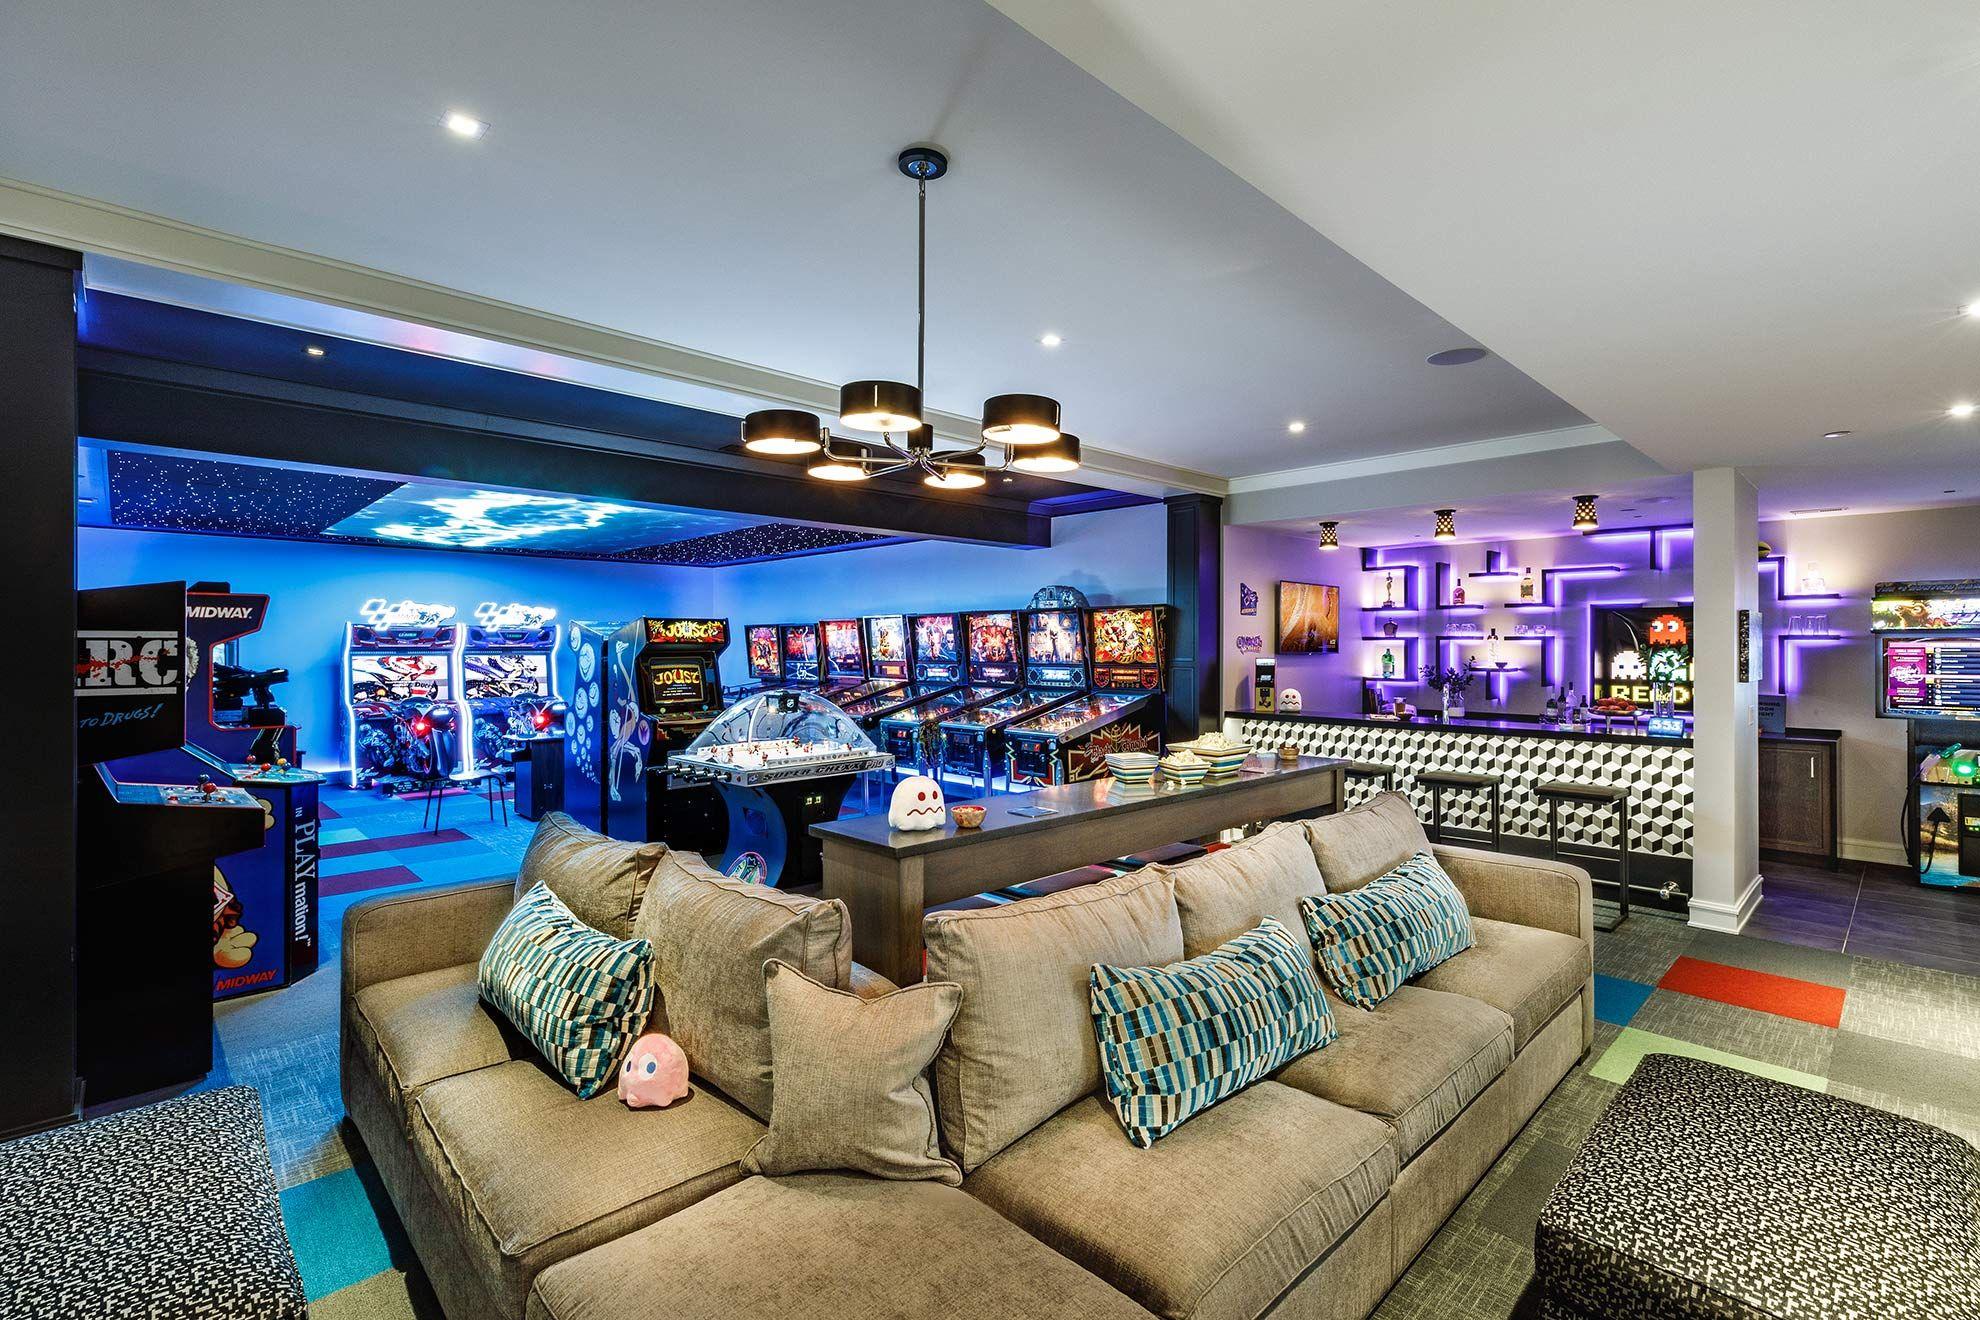 Arcade Room W Bar Arcade Room Game Room Basement Arcade Game Room